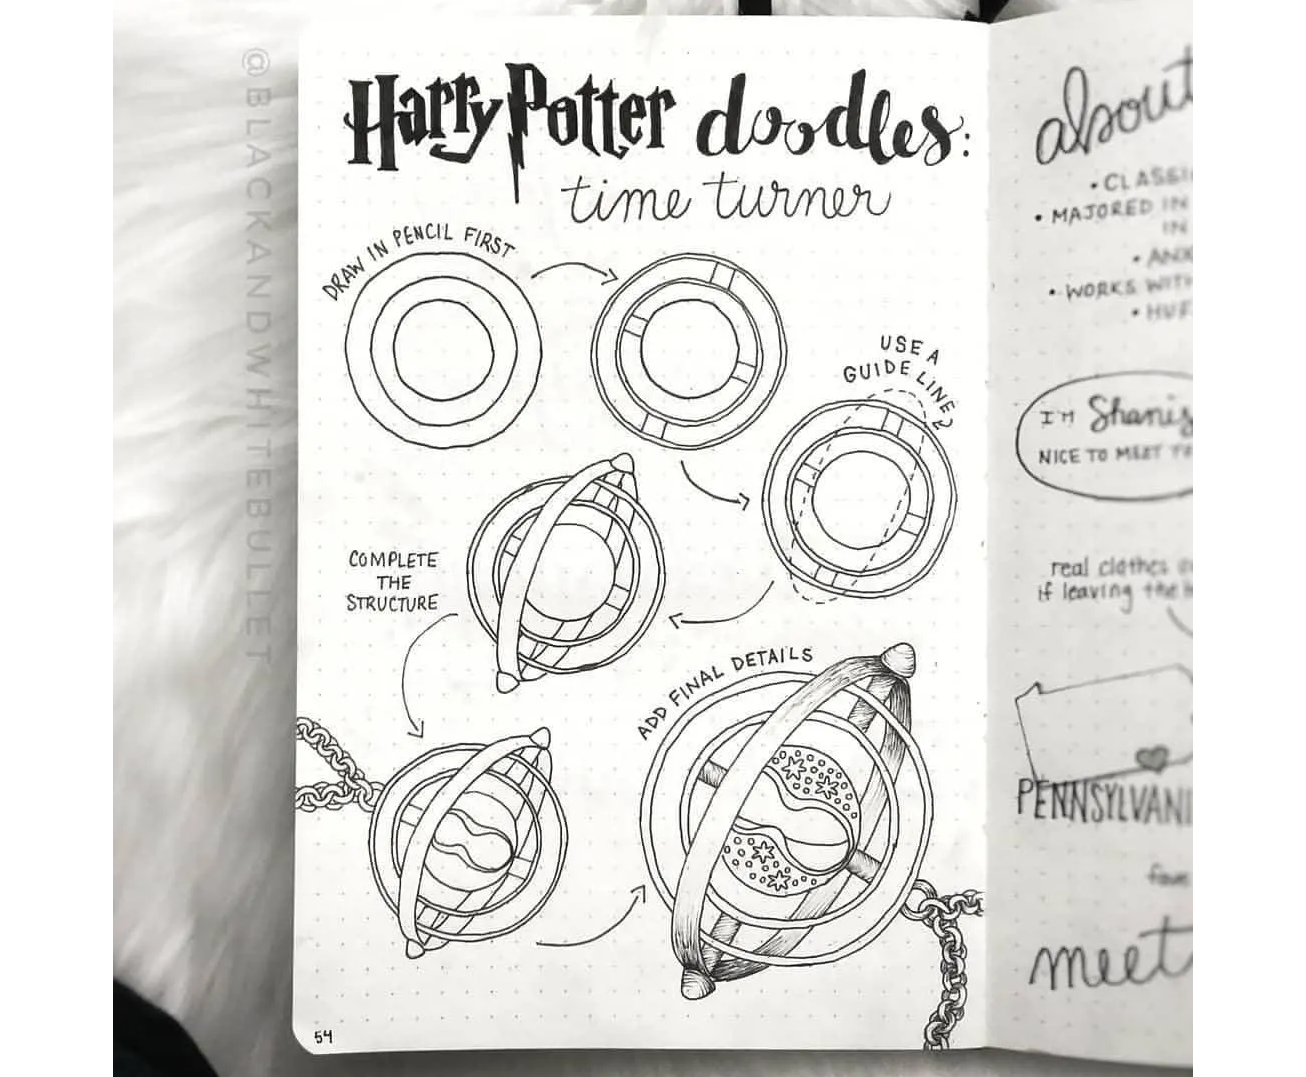 Harry potter vẽ nguệch ngoạc